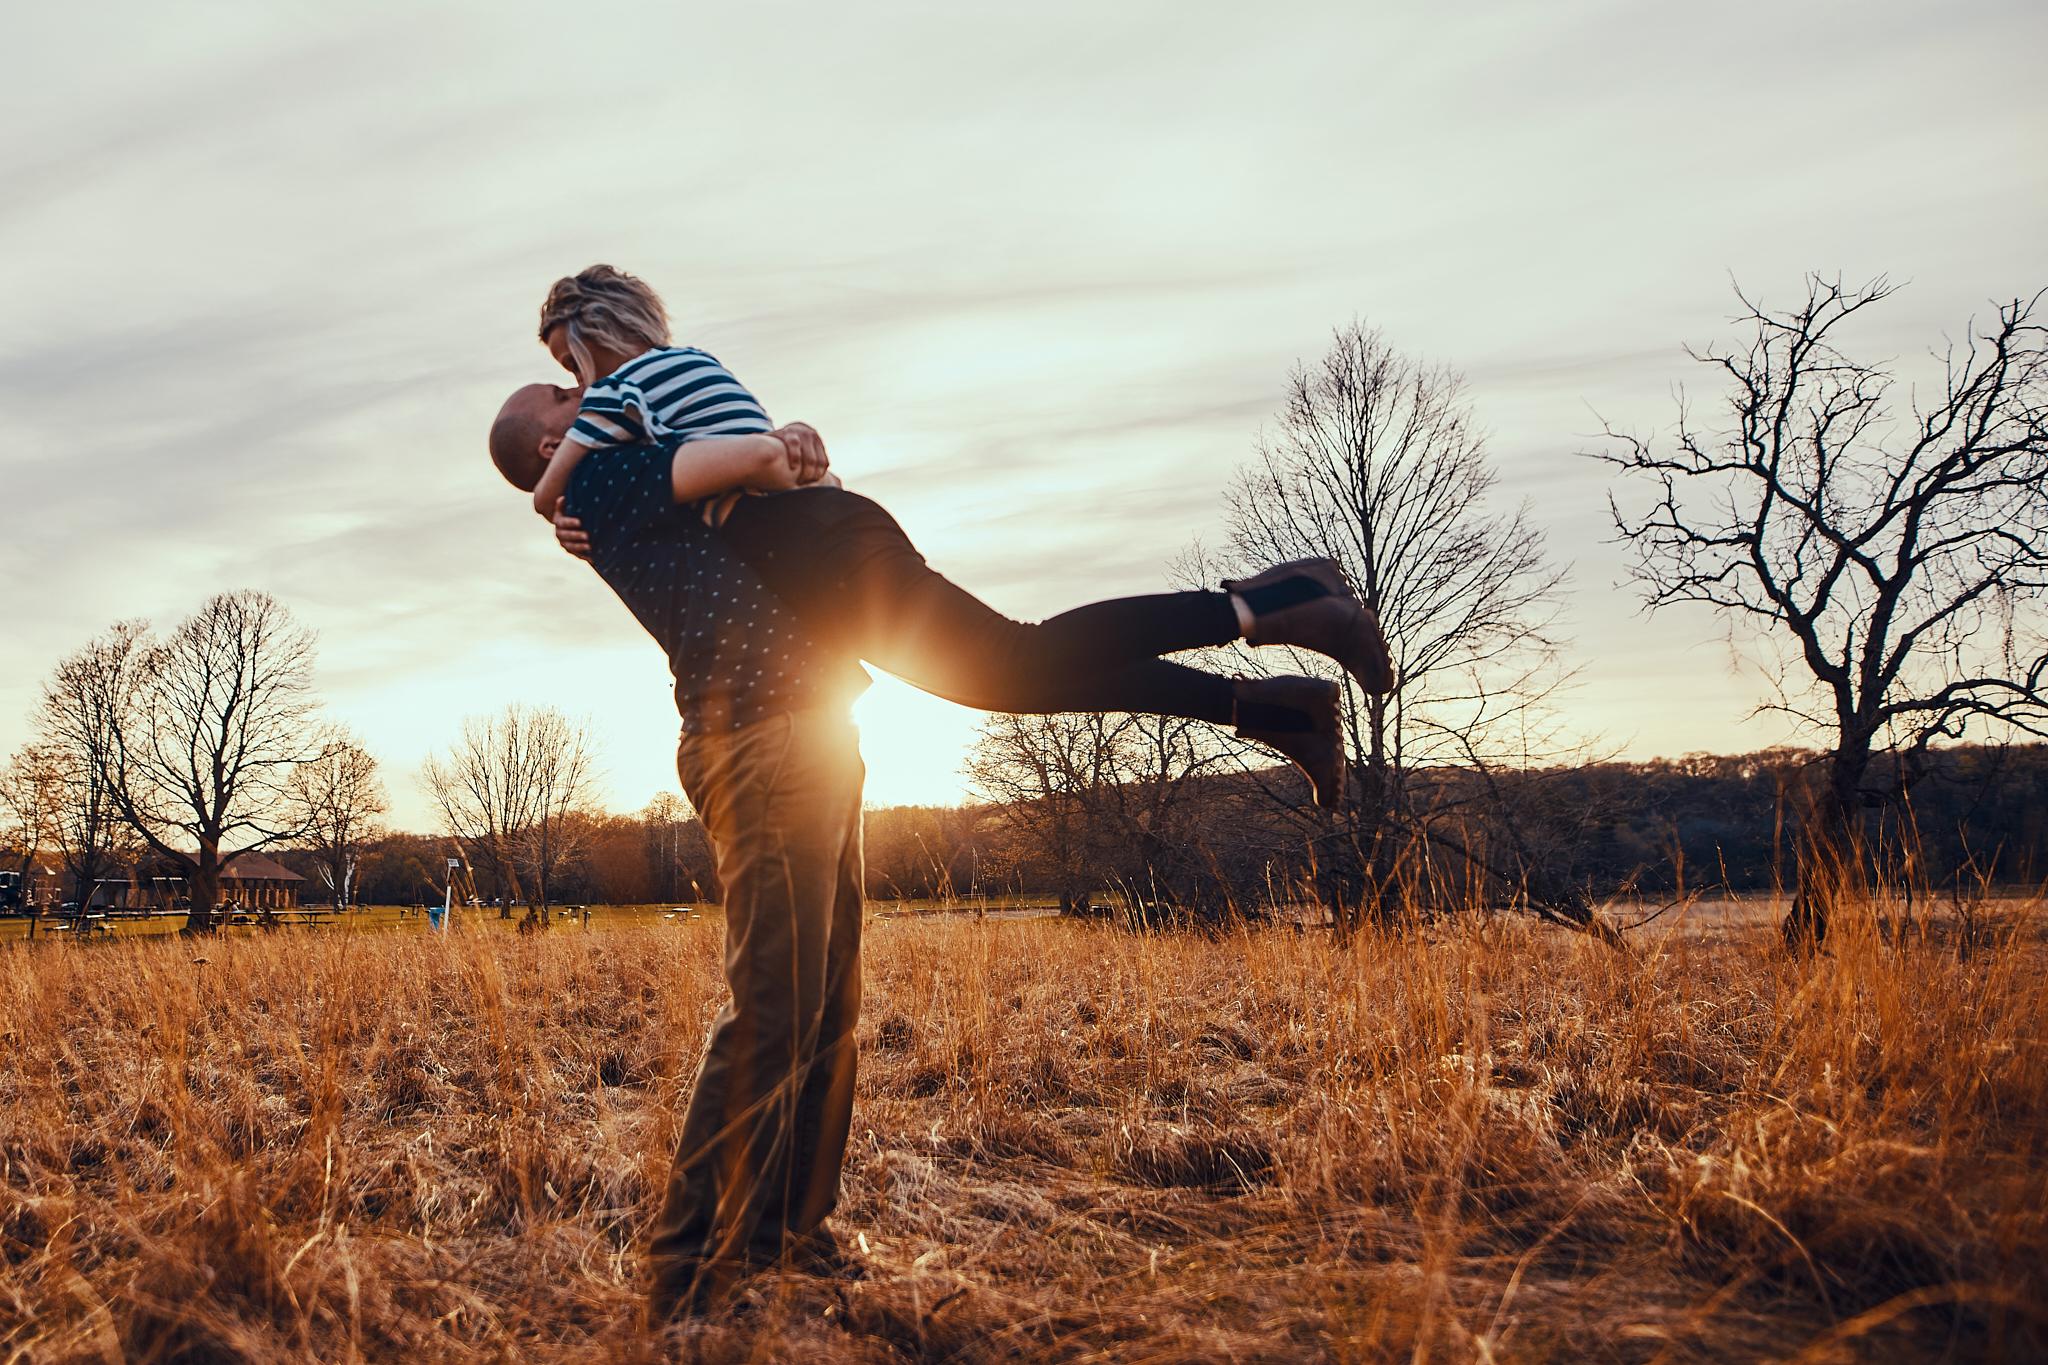 Engagement_Photographer_Twin_Cities_St_Paul_Miinneapolis_Lifestyle_Outdoor_Somethin_Candi_Photography_011.JPG